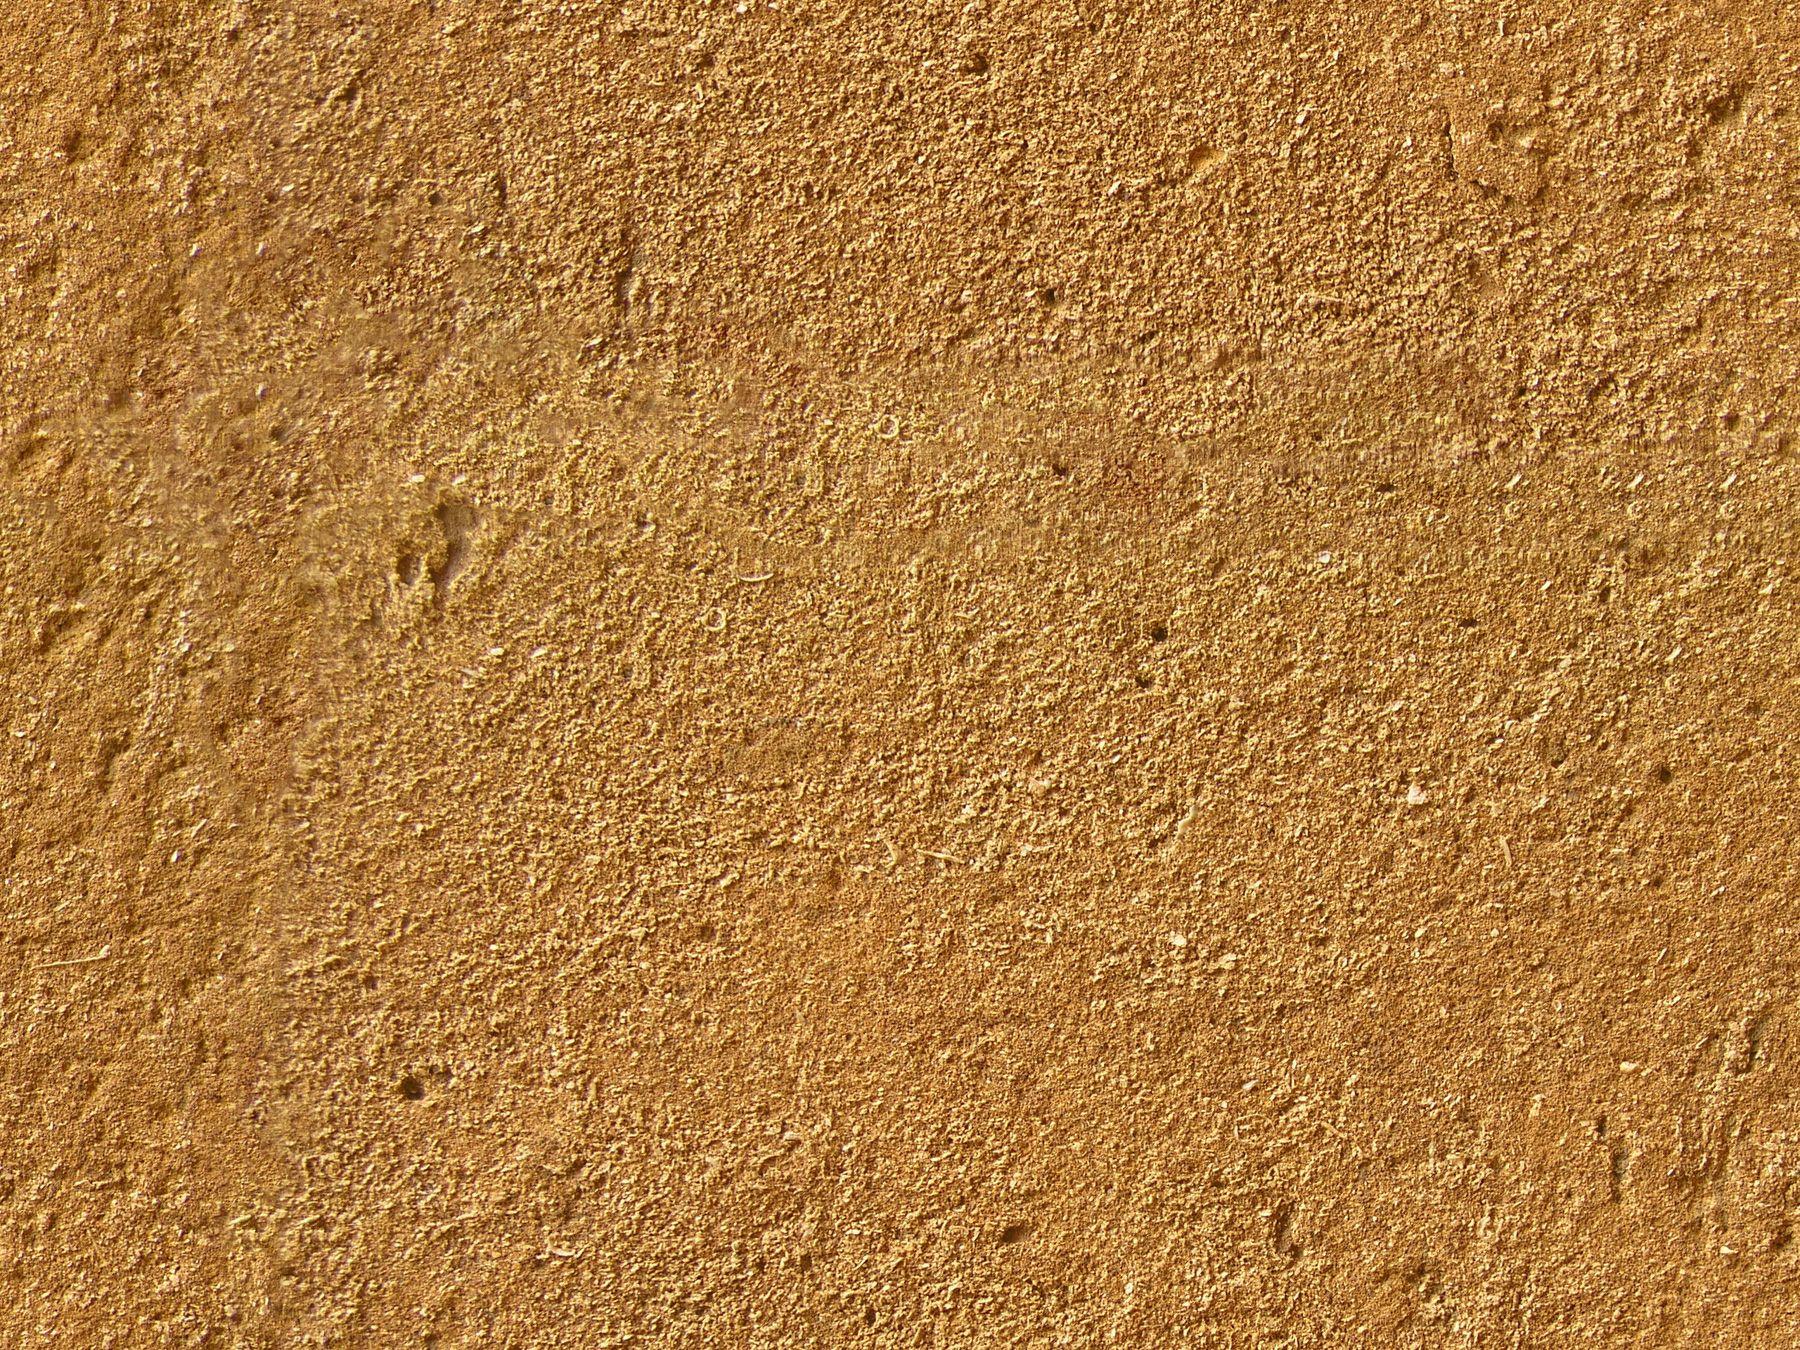 Sandstone texture | Set 2015 | Pinterest | Beach ...